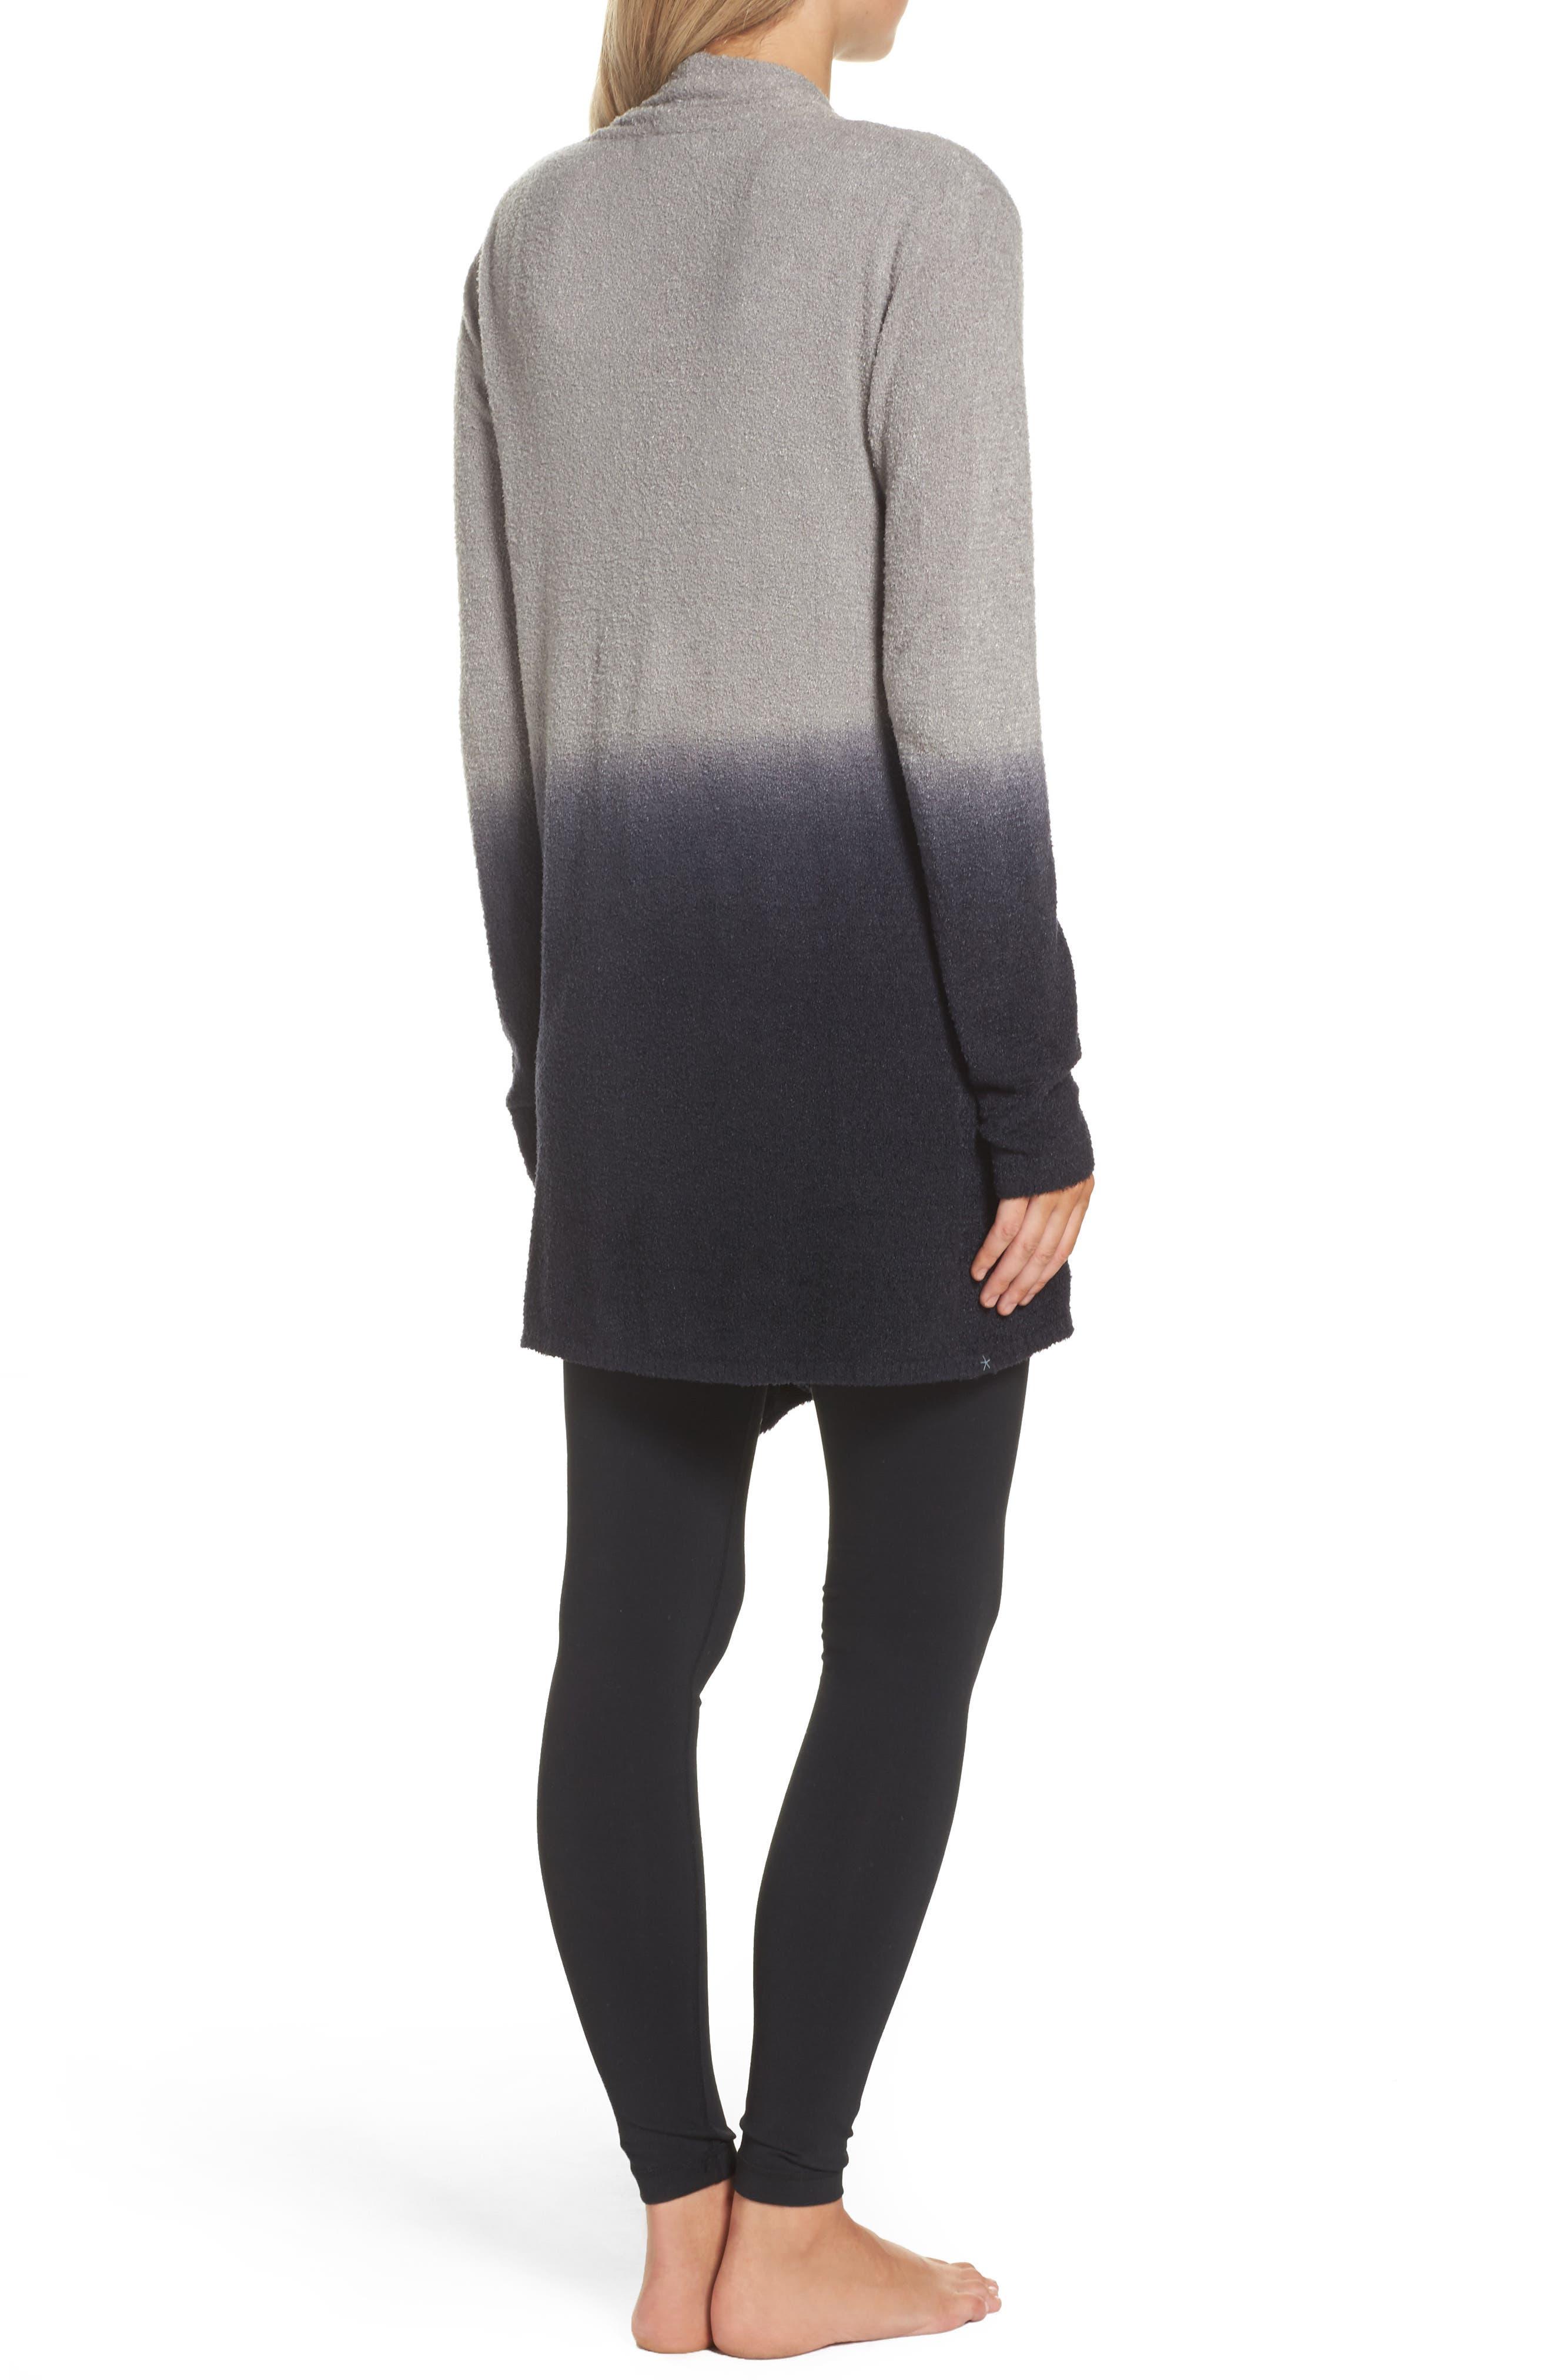 Alternate Image 2  - Barefoot Dreams® CozyChic Lite® Calypso Wrap Cardigan (Nordstrom Exclusive)